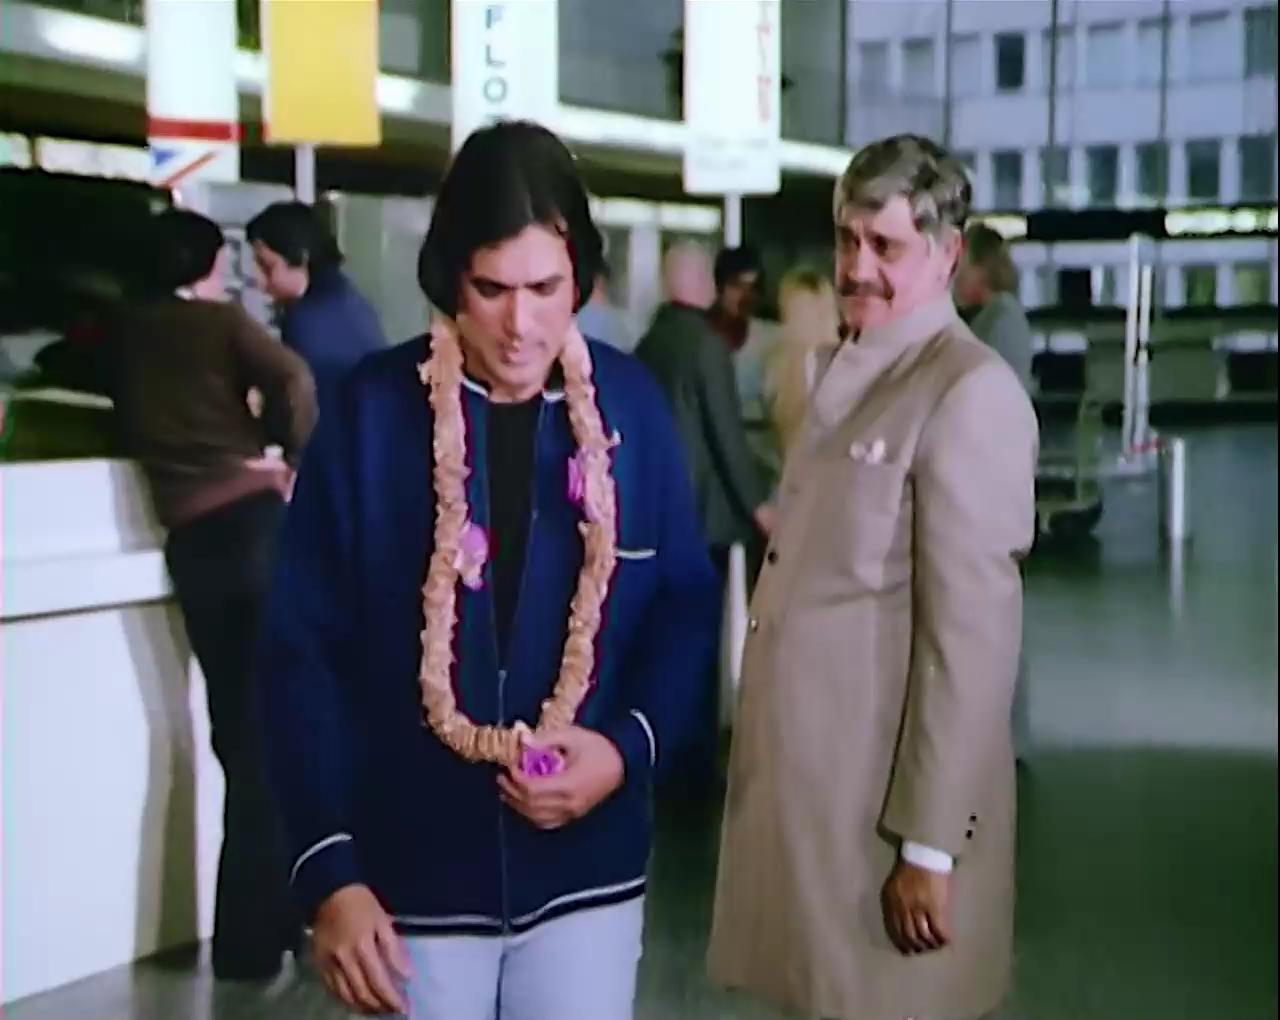 Aashiq.Hoon.Baharon.Ka.1977.WEBRip.AVC.AAC.1080p_DusIcTv[(196527)07-19-43].JPG